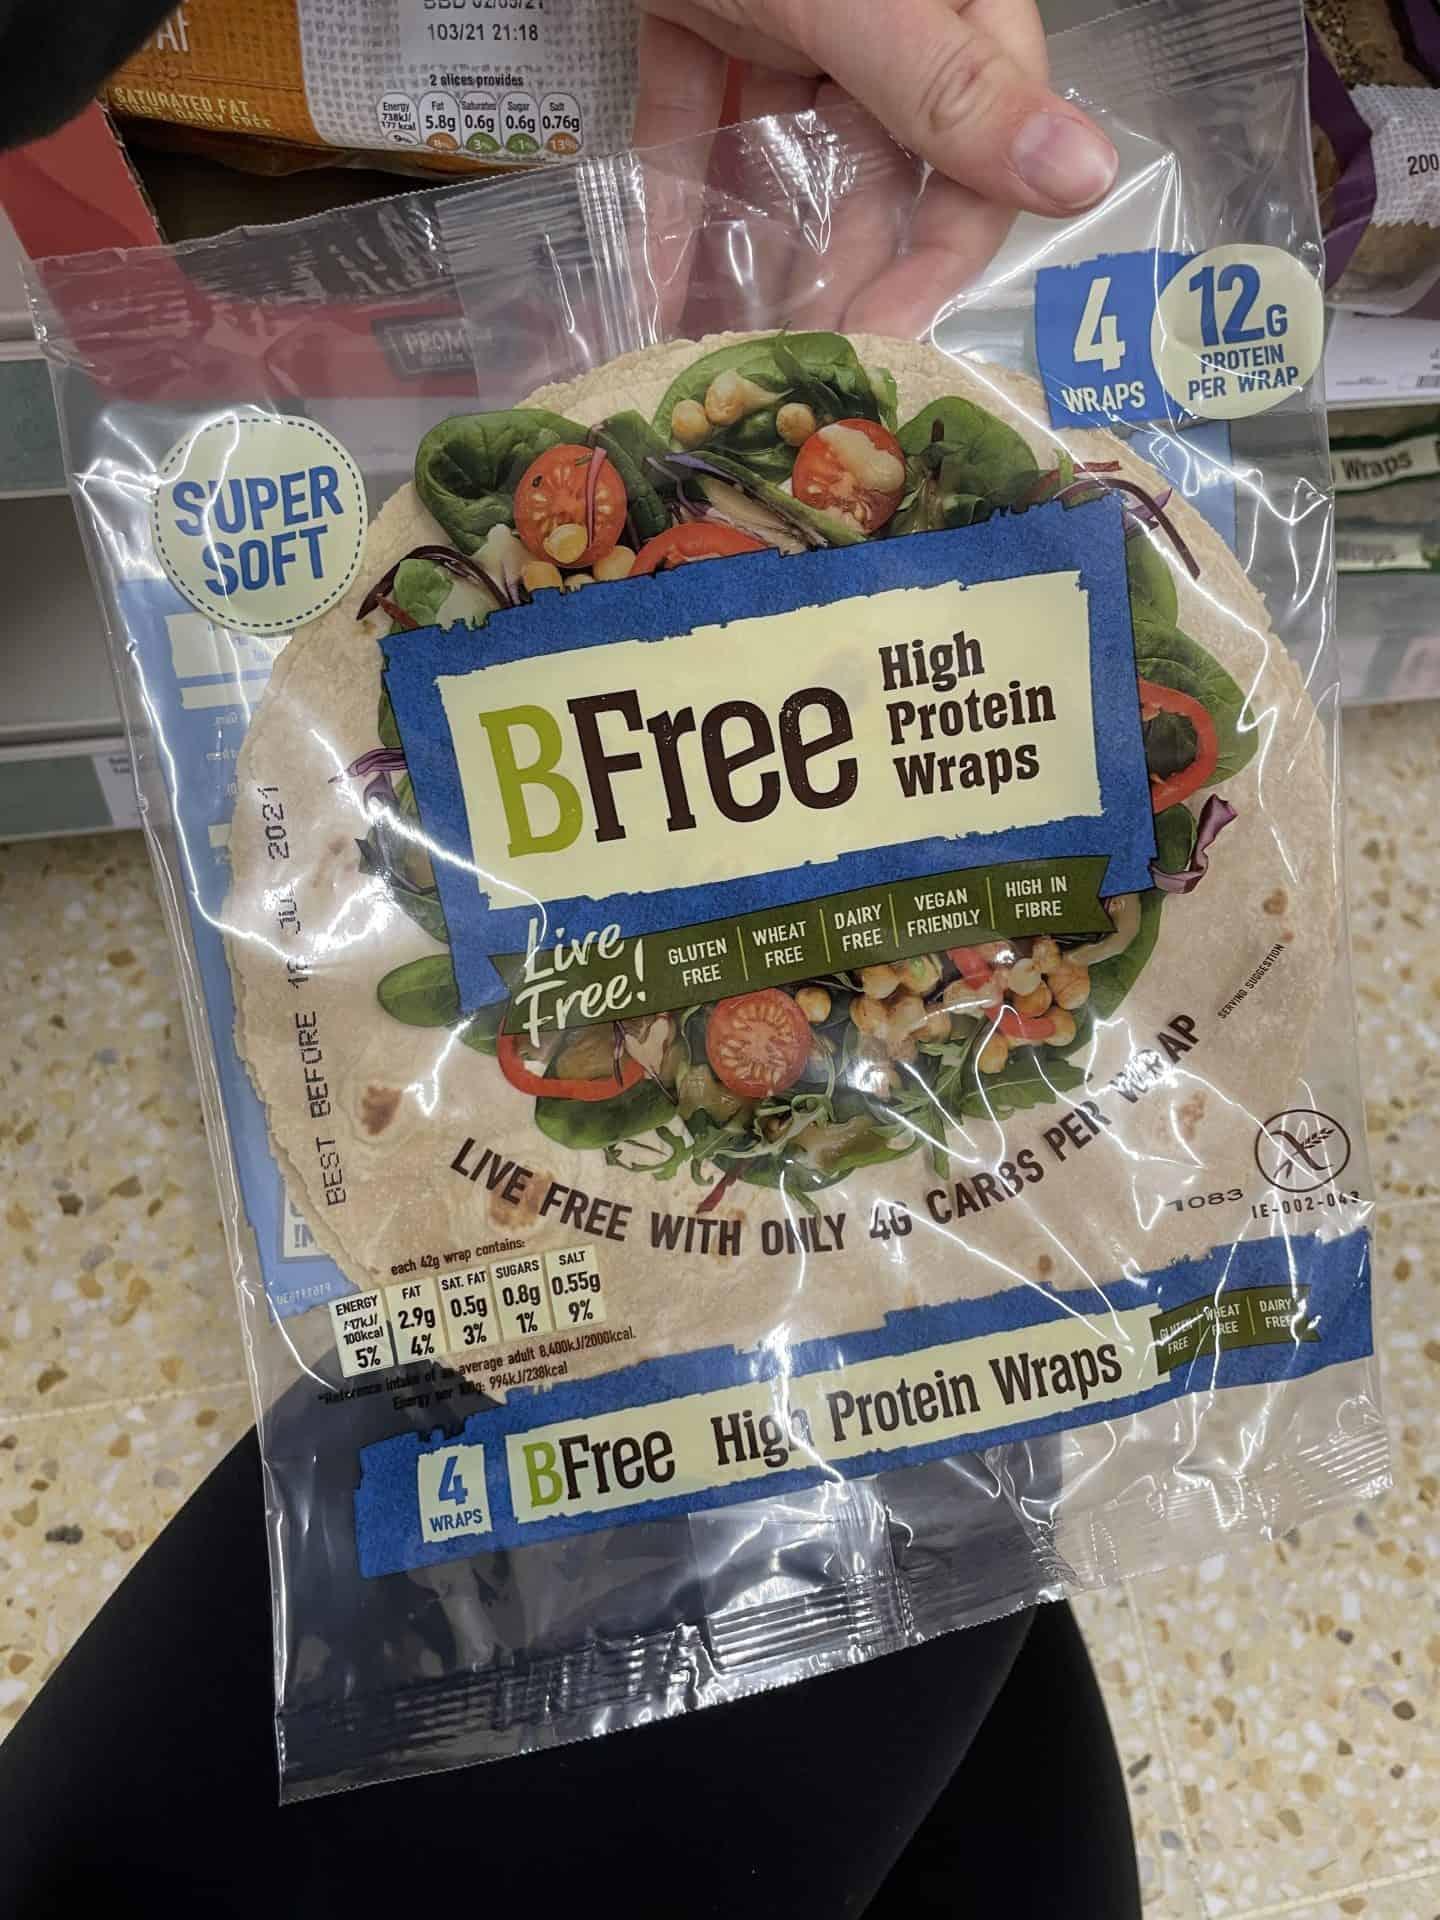 bfree high protein gluten free wraps